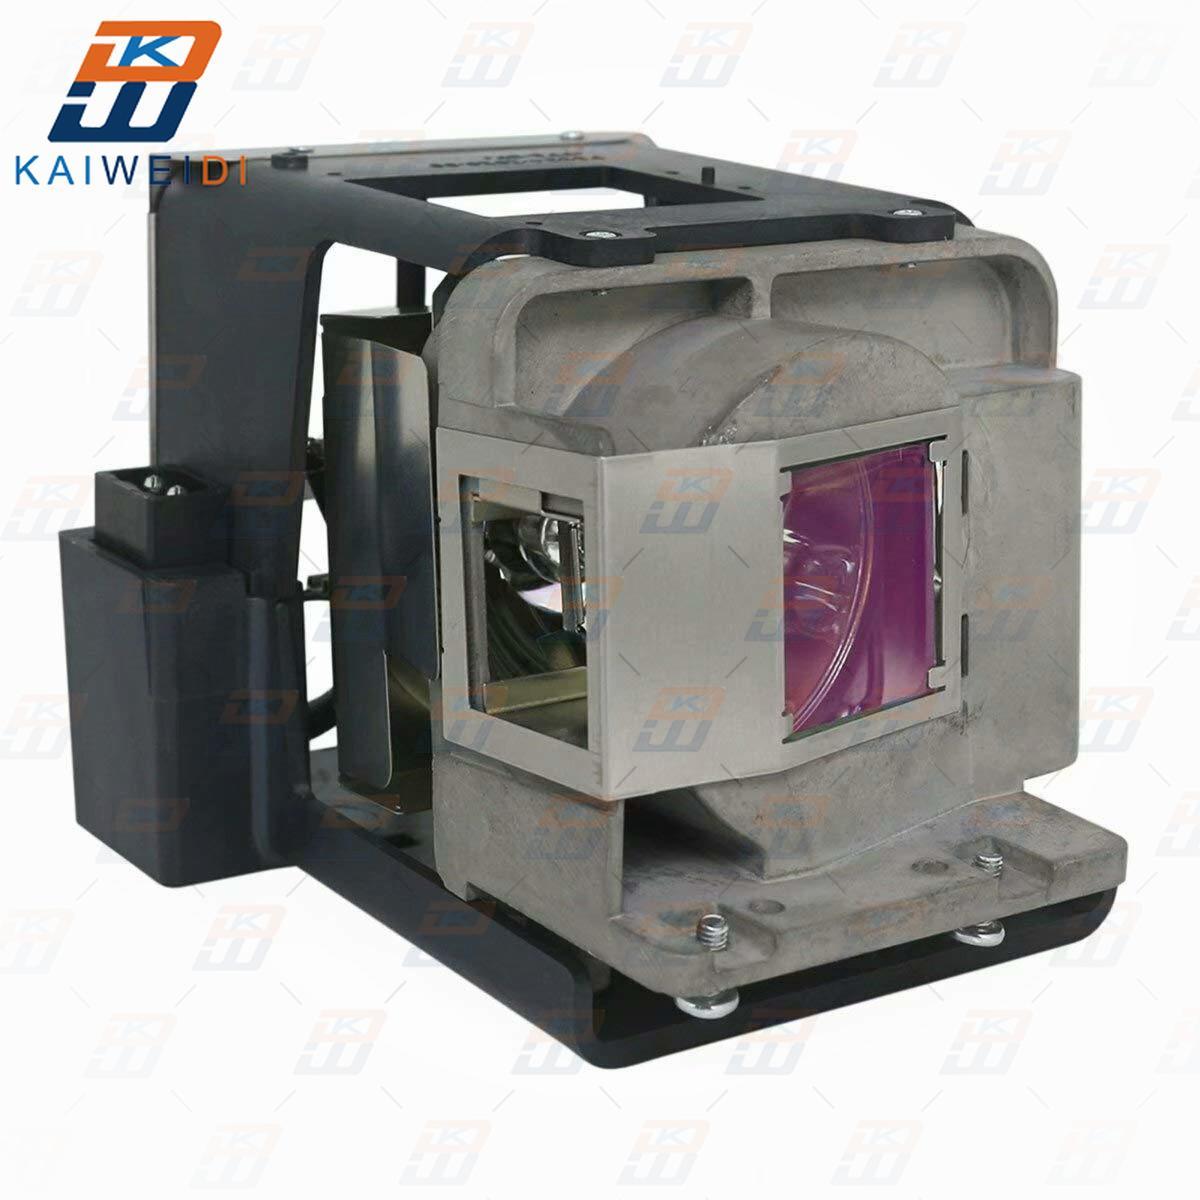 BL-FU310A / FX.PM484-2401 / BL-FU310C Projector Replacement Lamp Fit For OPTOMA X501,W501,EH501,EW420,HD151X,HD36 Projectors